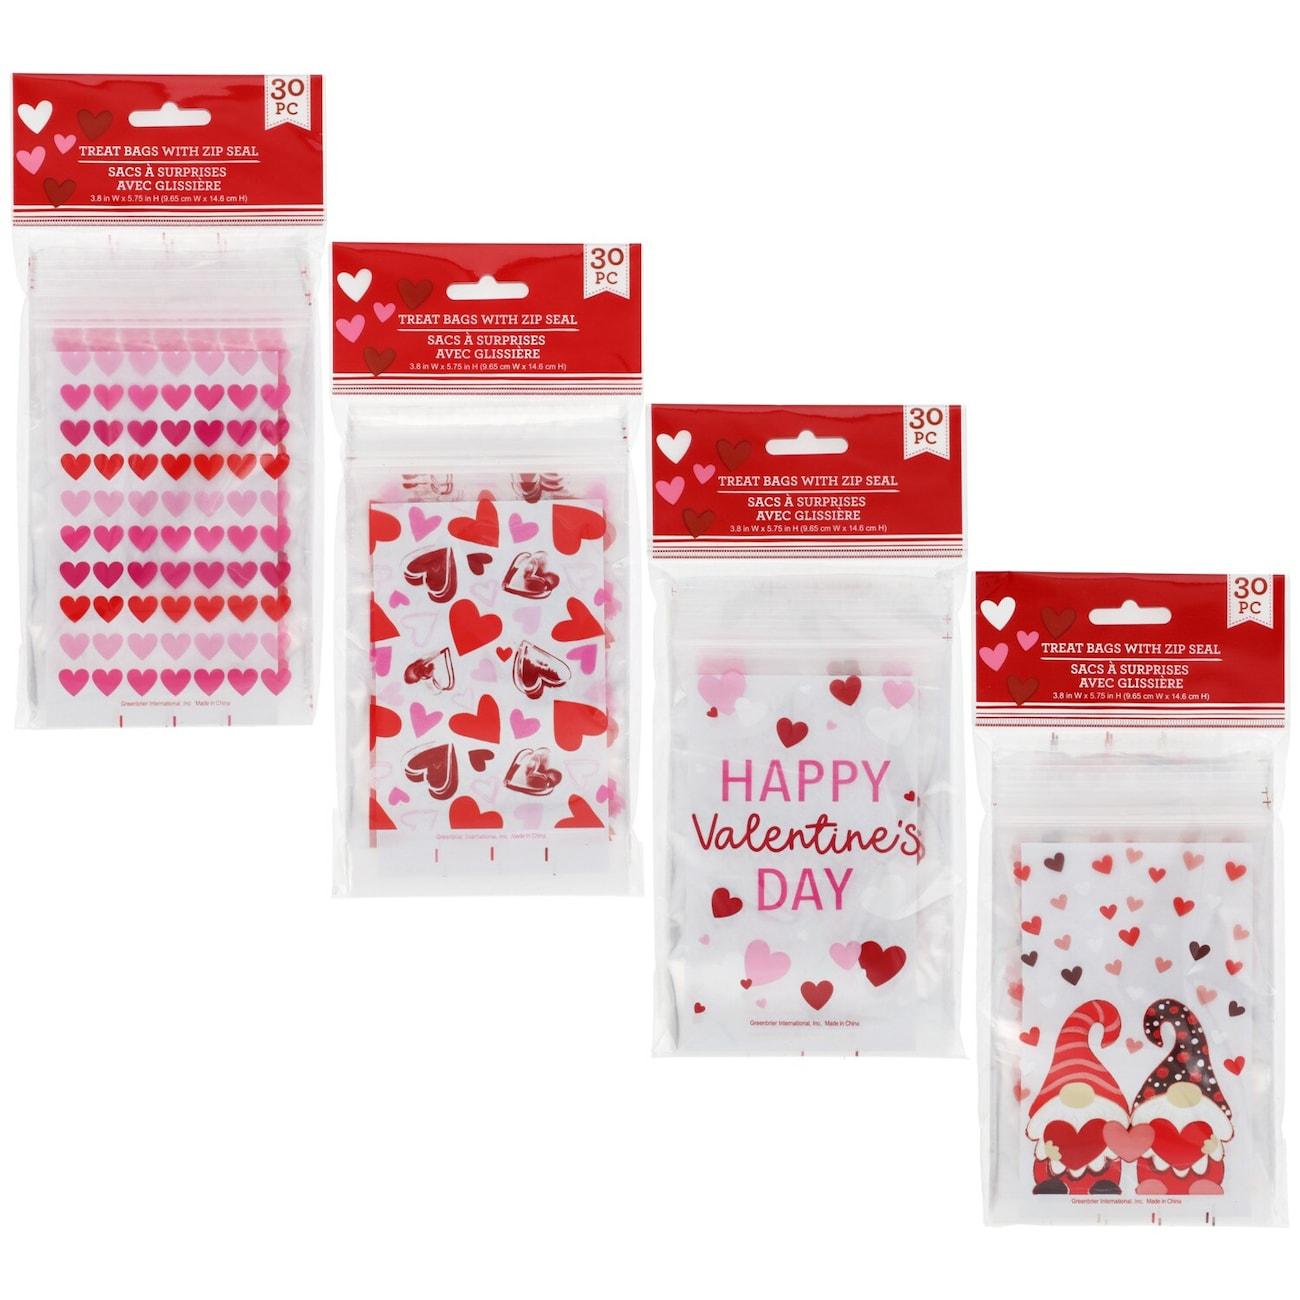 Valentines Day Treat Bags Dollar Tree Inc